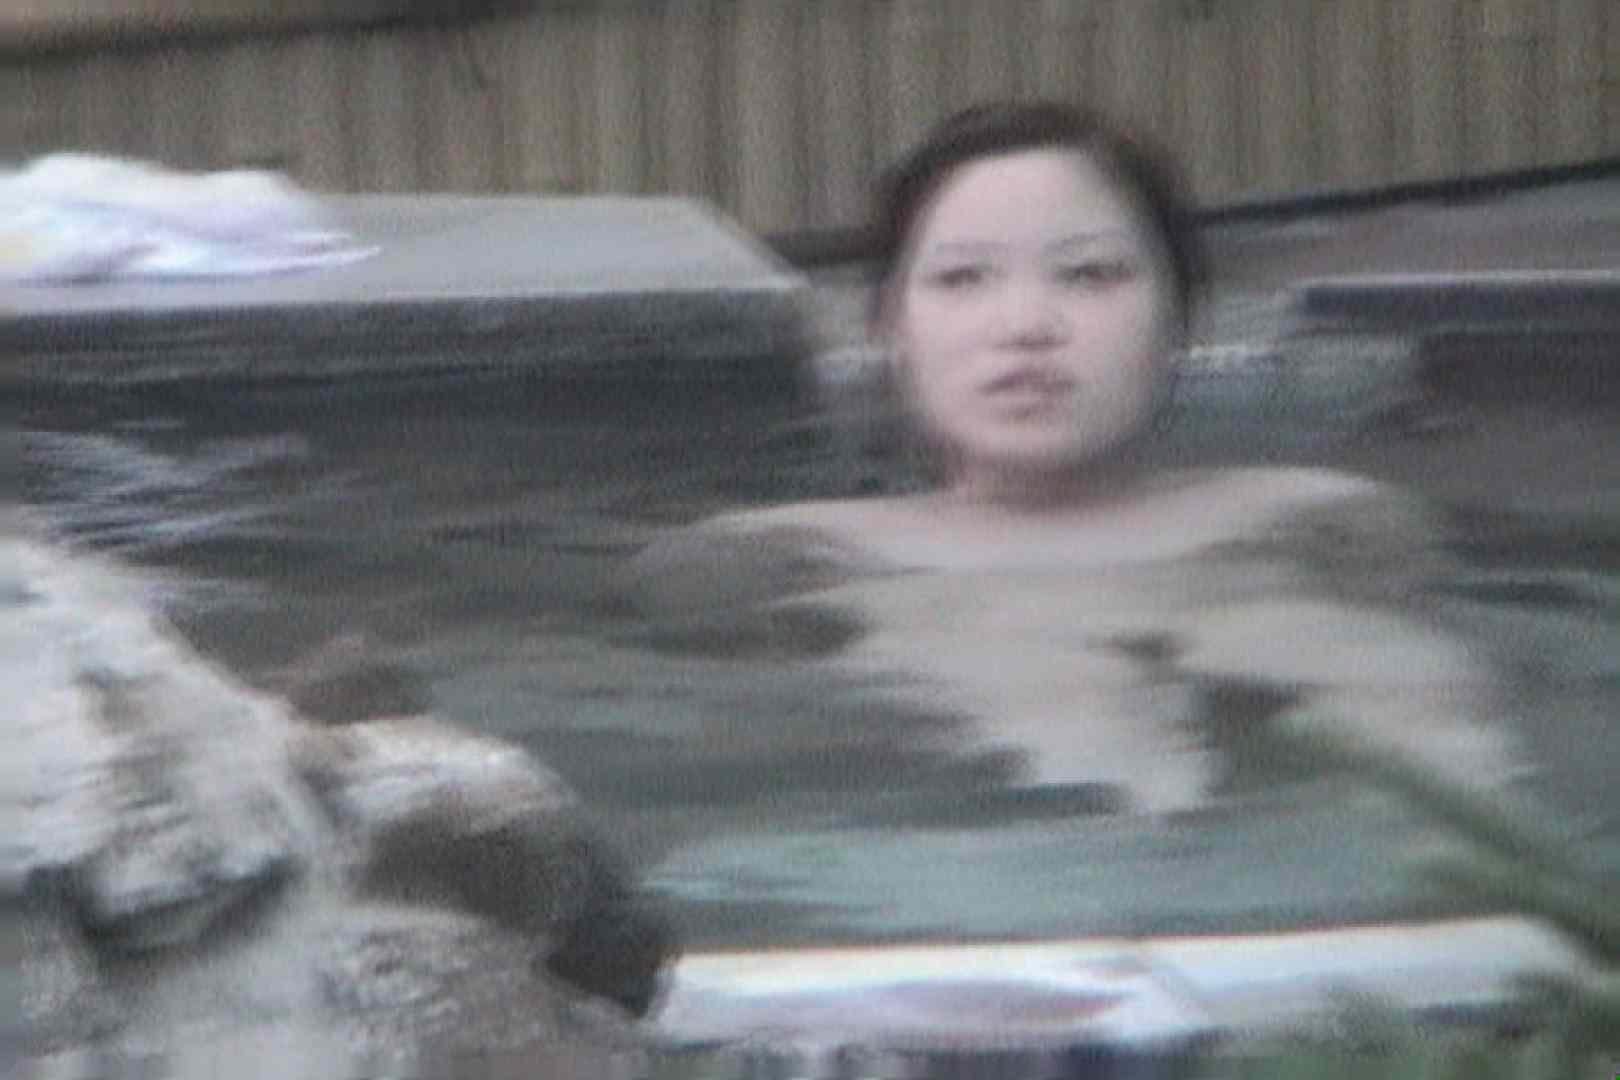 Aquaな露天風呂Vol.602 盗撮師作品  98pic 54